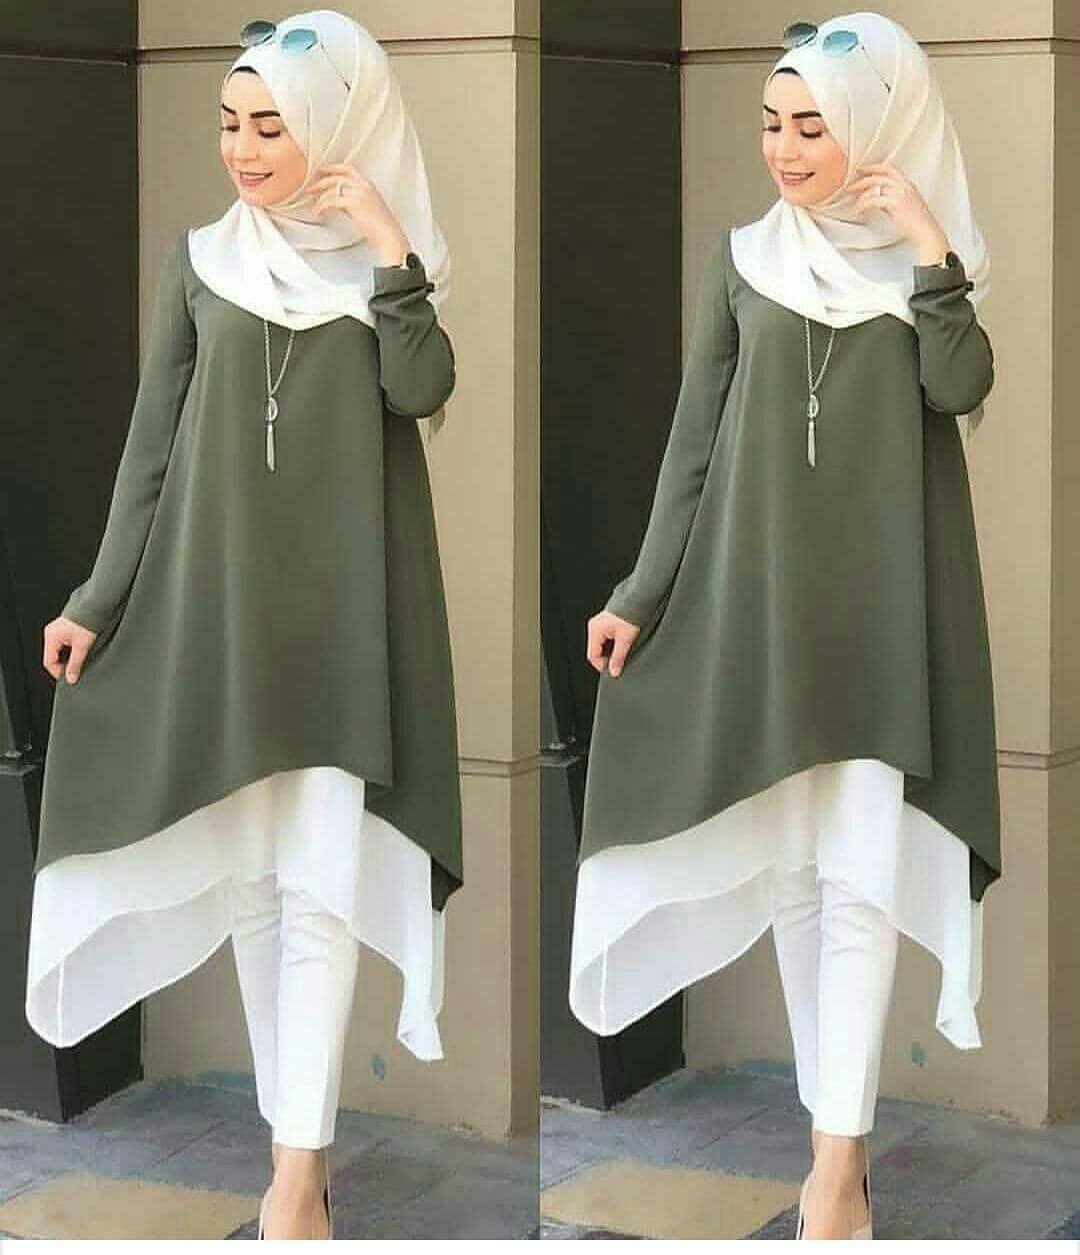 Baju Muslim Kalita Tunik Wolfice Atasan Wanita Muslim Panjang Pakaian Cewek  Original Fashion Terbaru Kekinian Blouse 18a4015b85